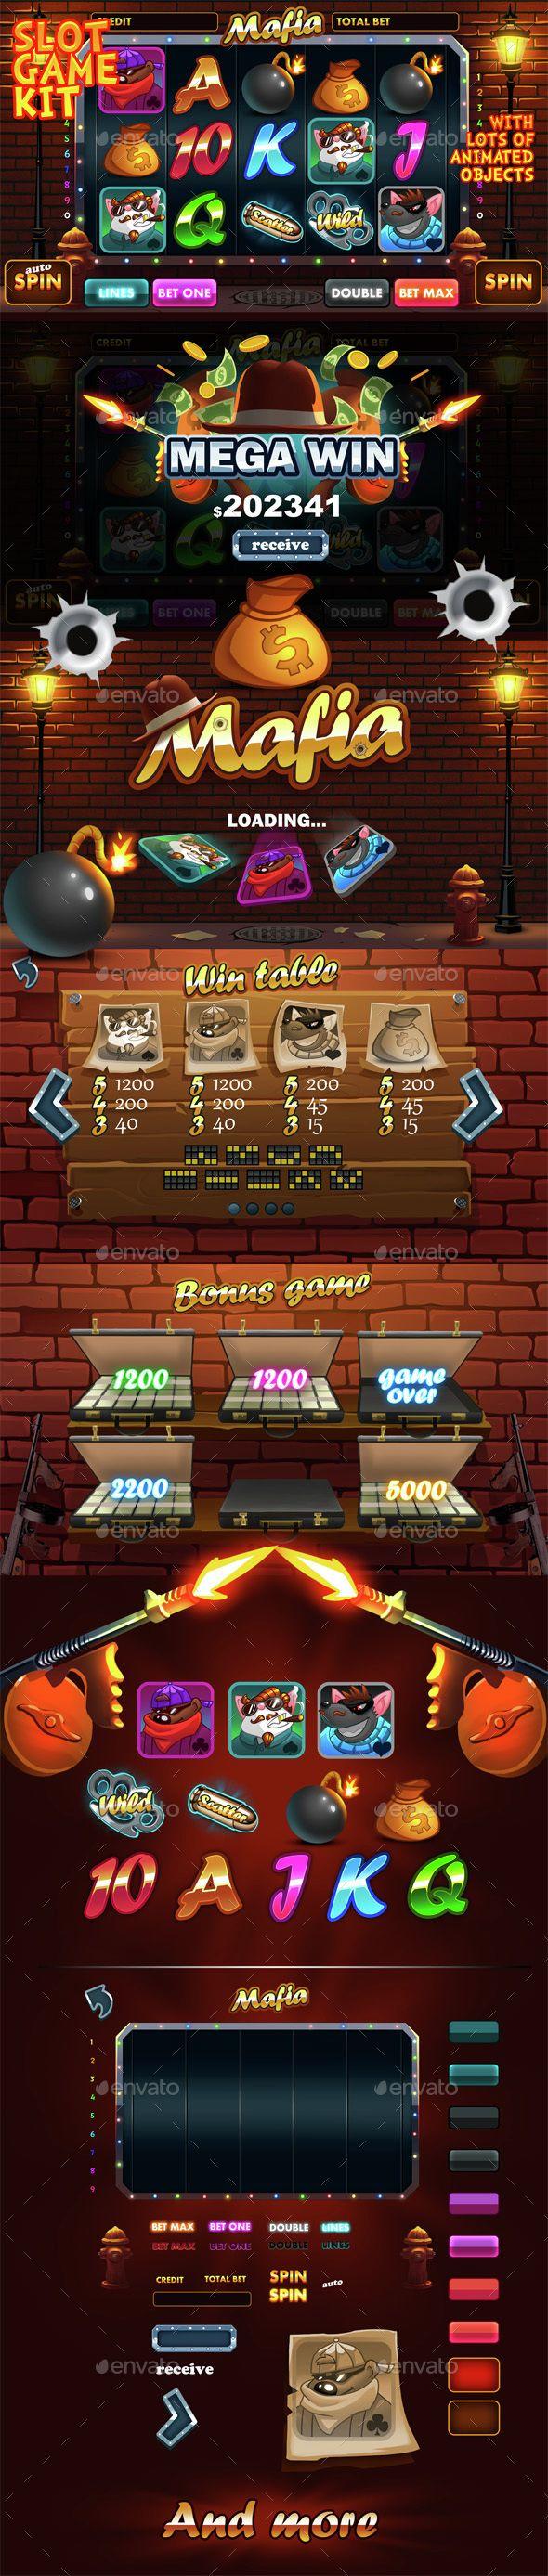 best games casino make money